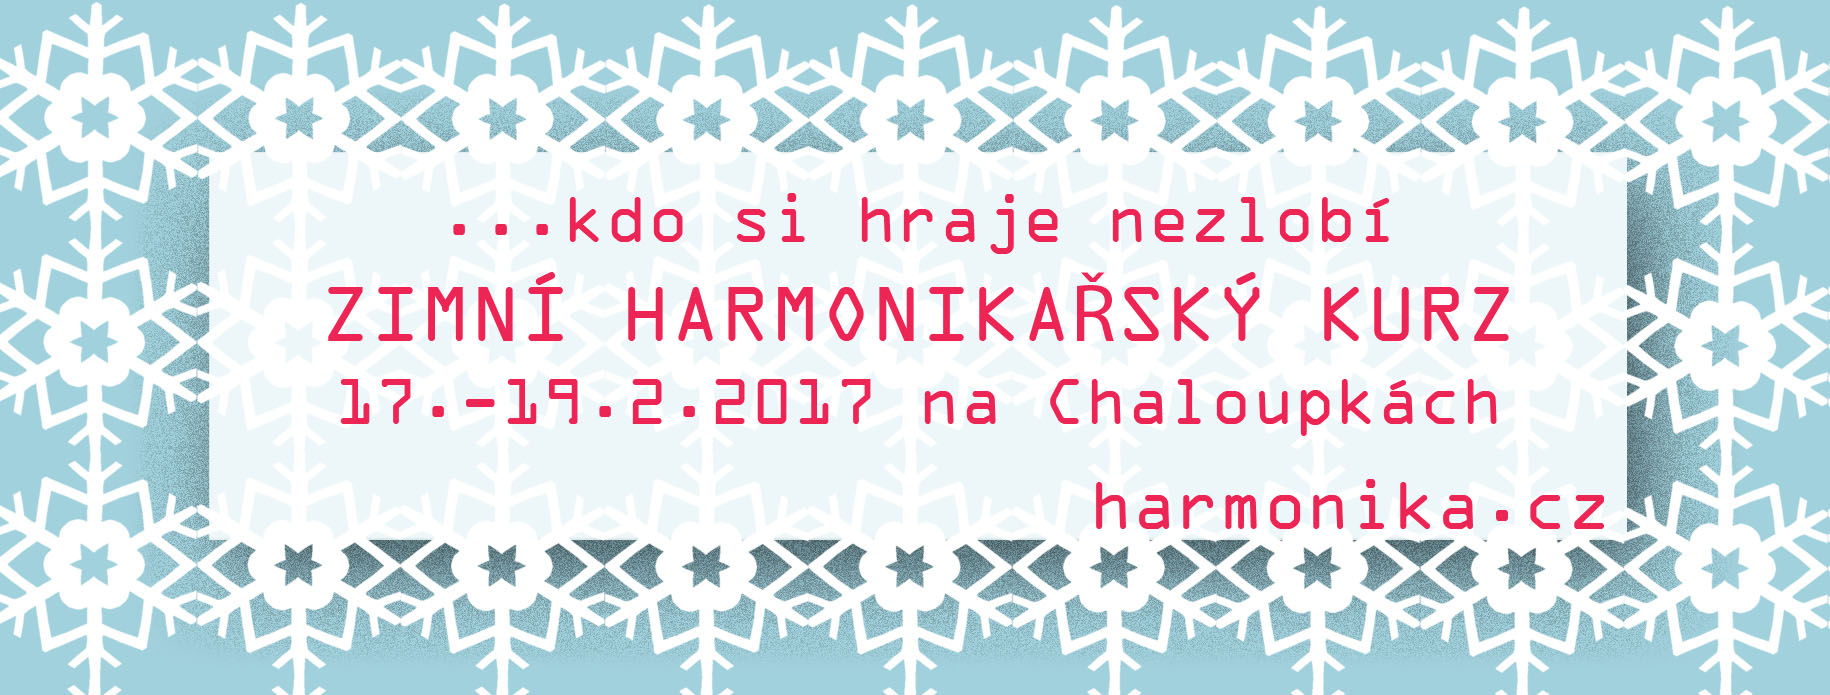 pozvanka-zimni2017